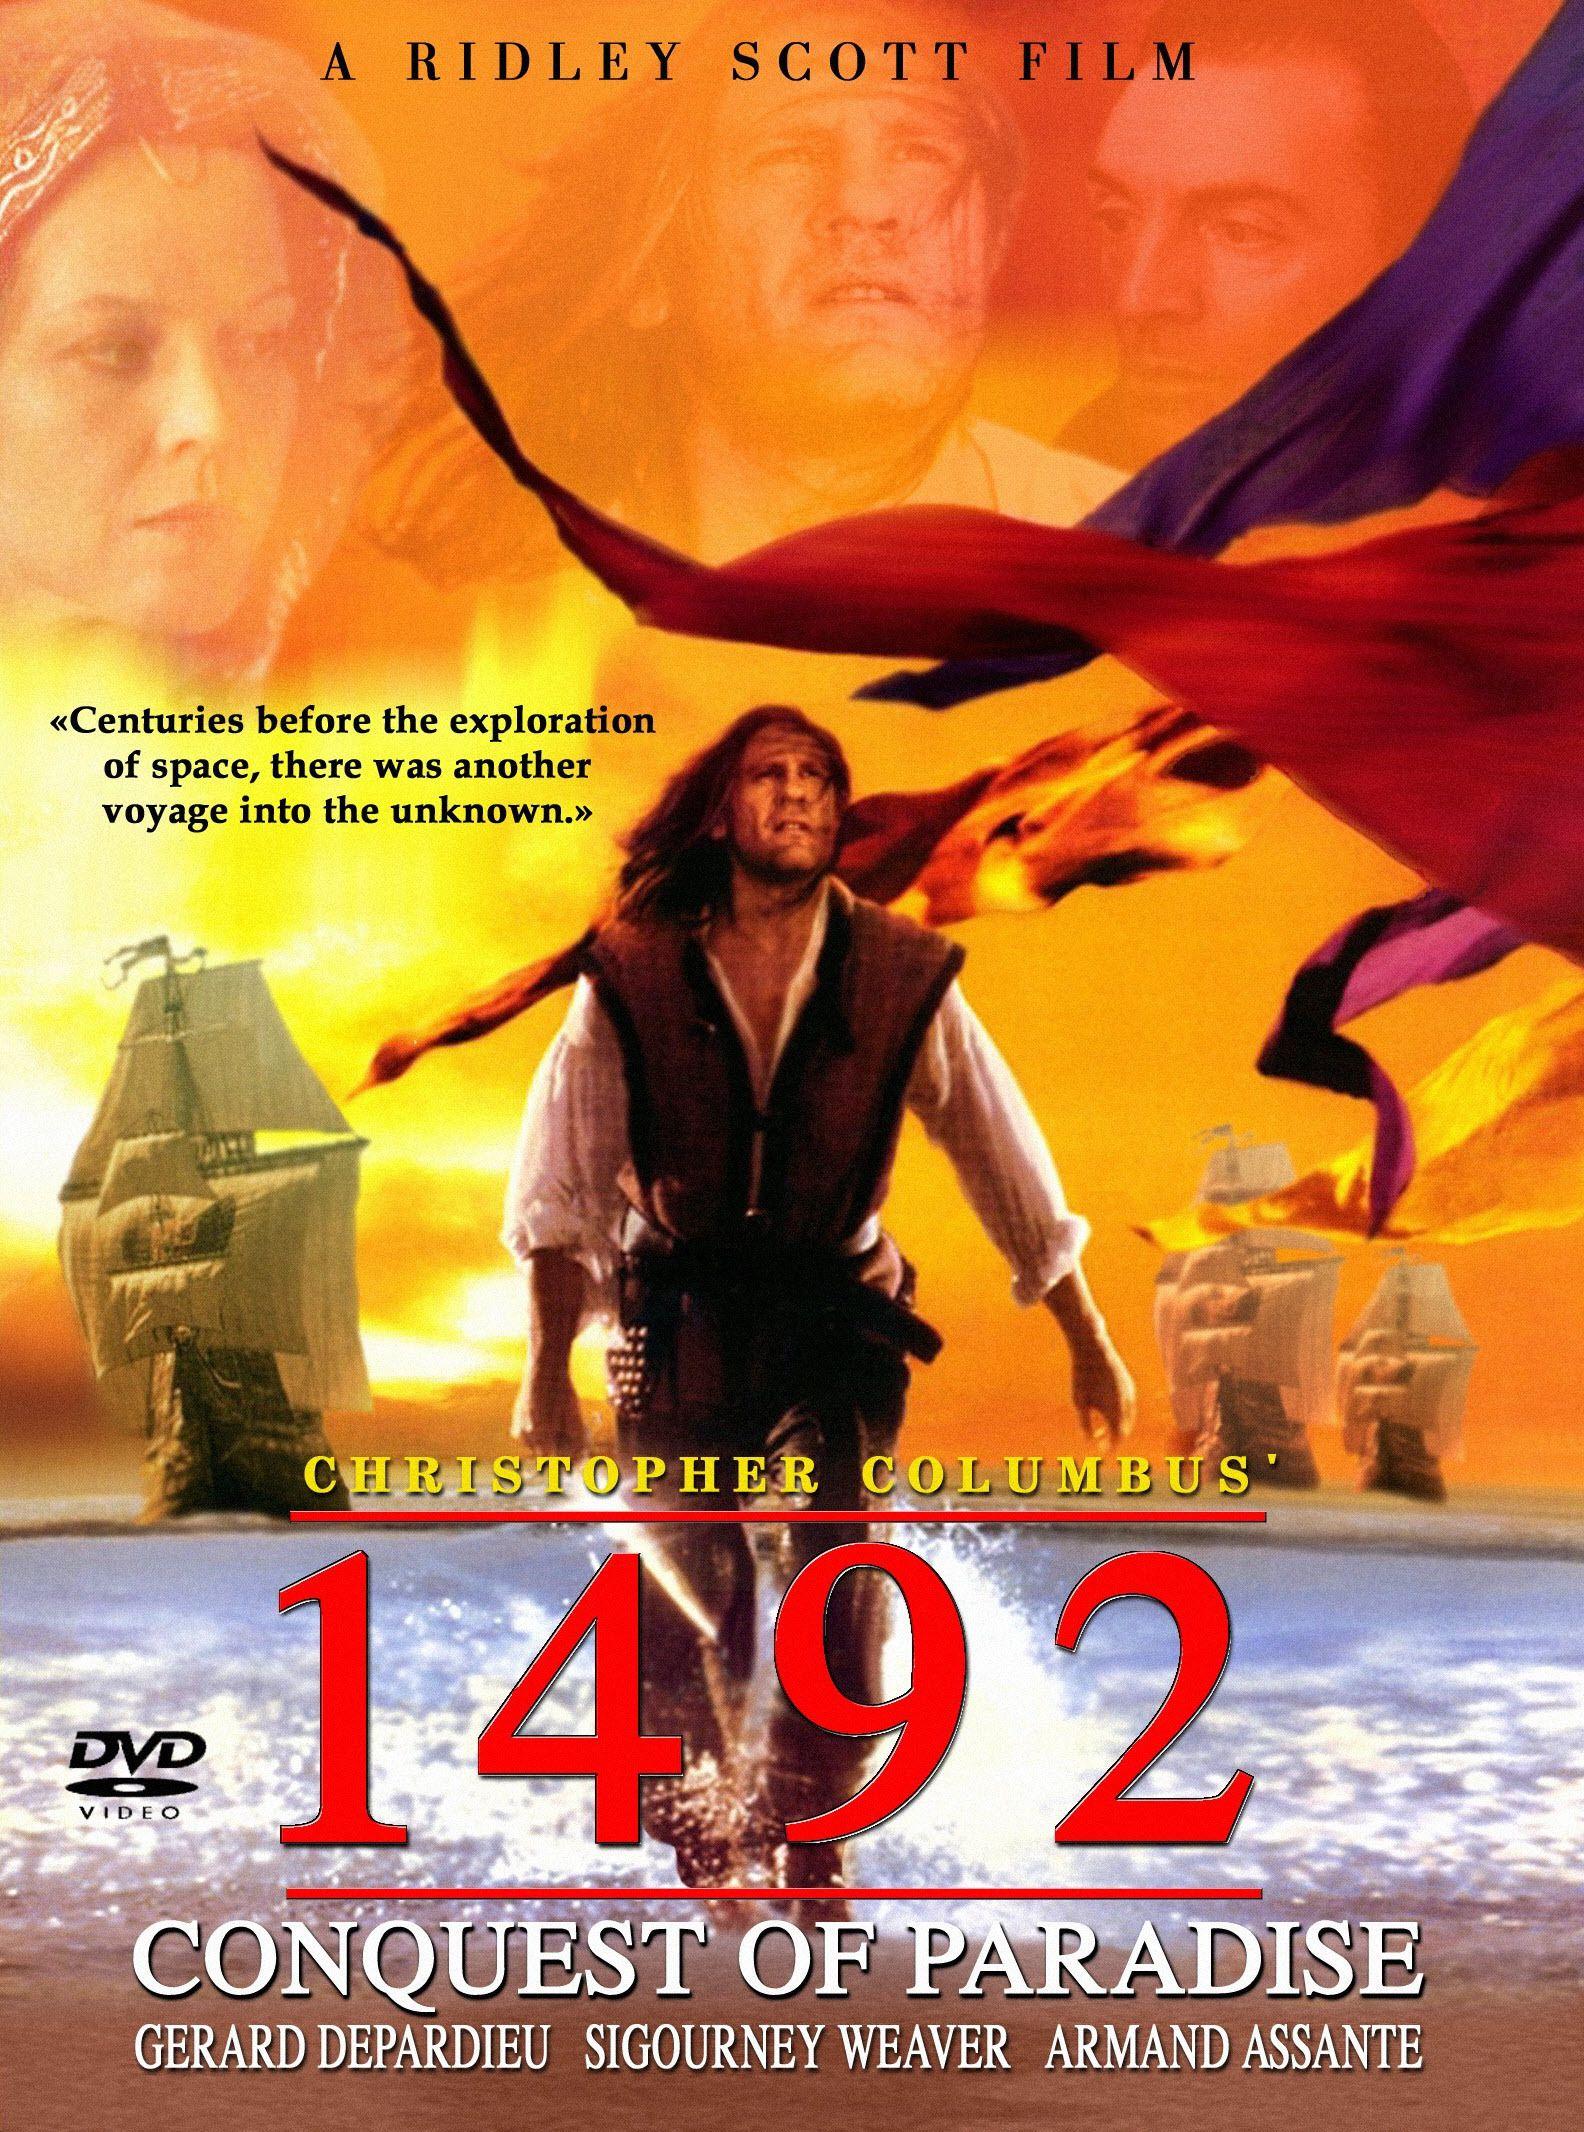 1492 Conquest of Paradise [1992] | Conquest of paradise ...